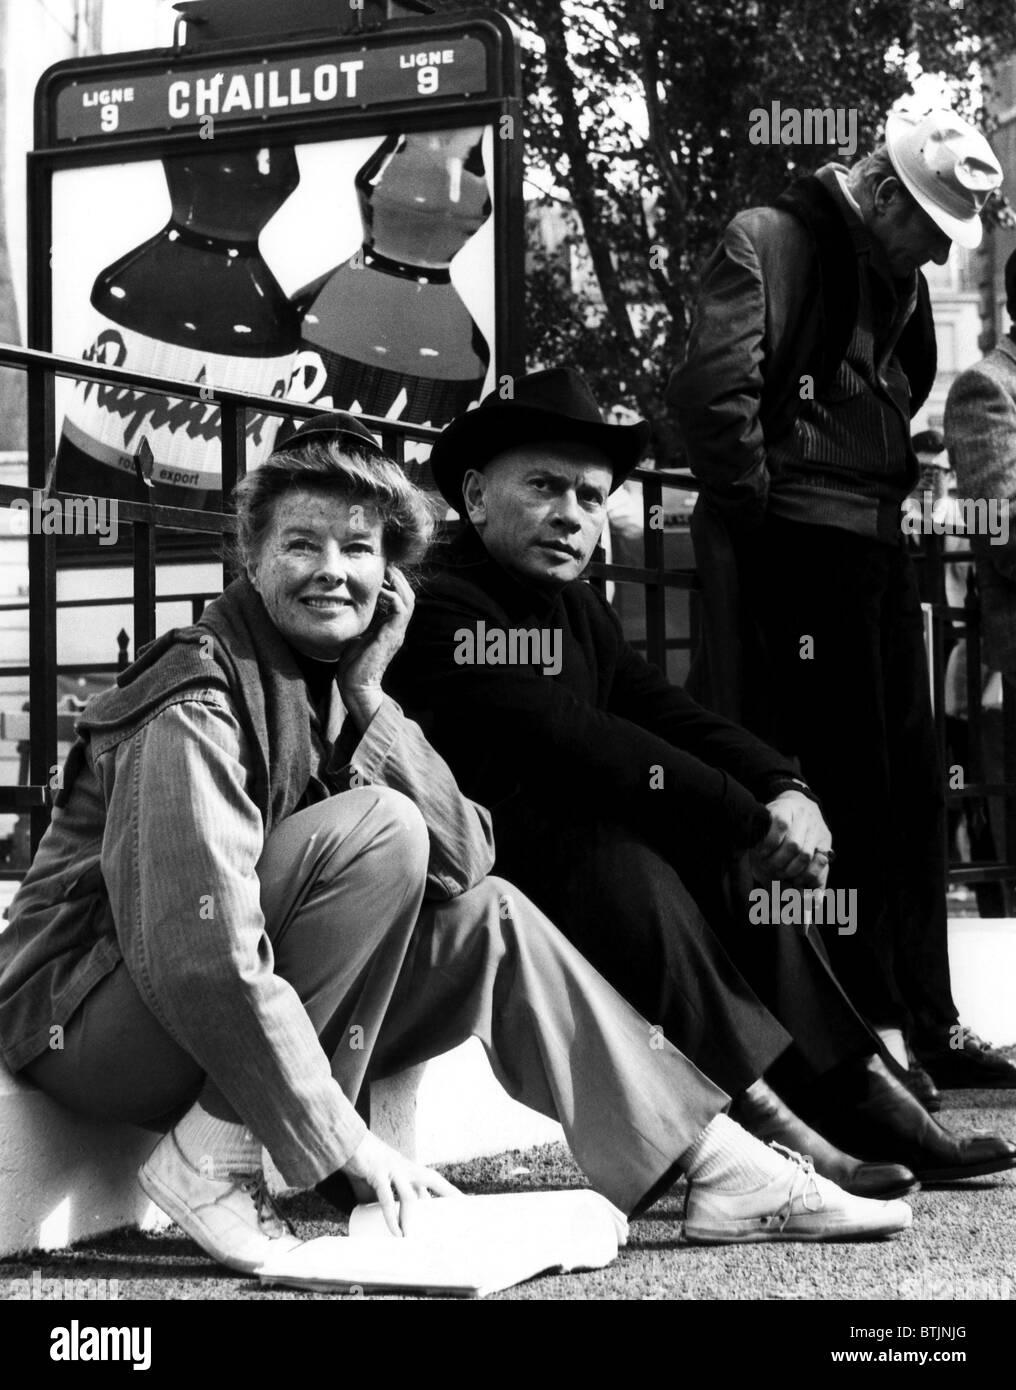 Katharine Hepburn, Yul Brynner e Danny Kaye sul set di' la donna pazza di Chaillot', Nice, Francia. 1968. Immagini Stock